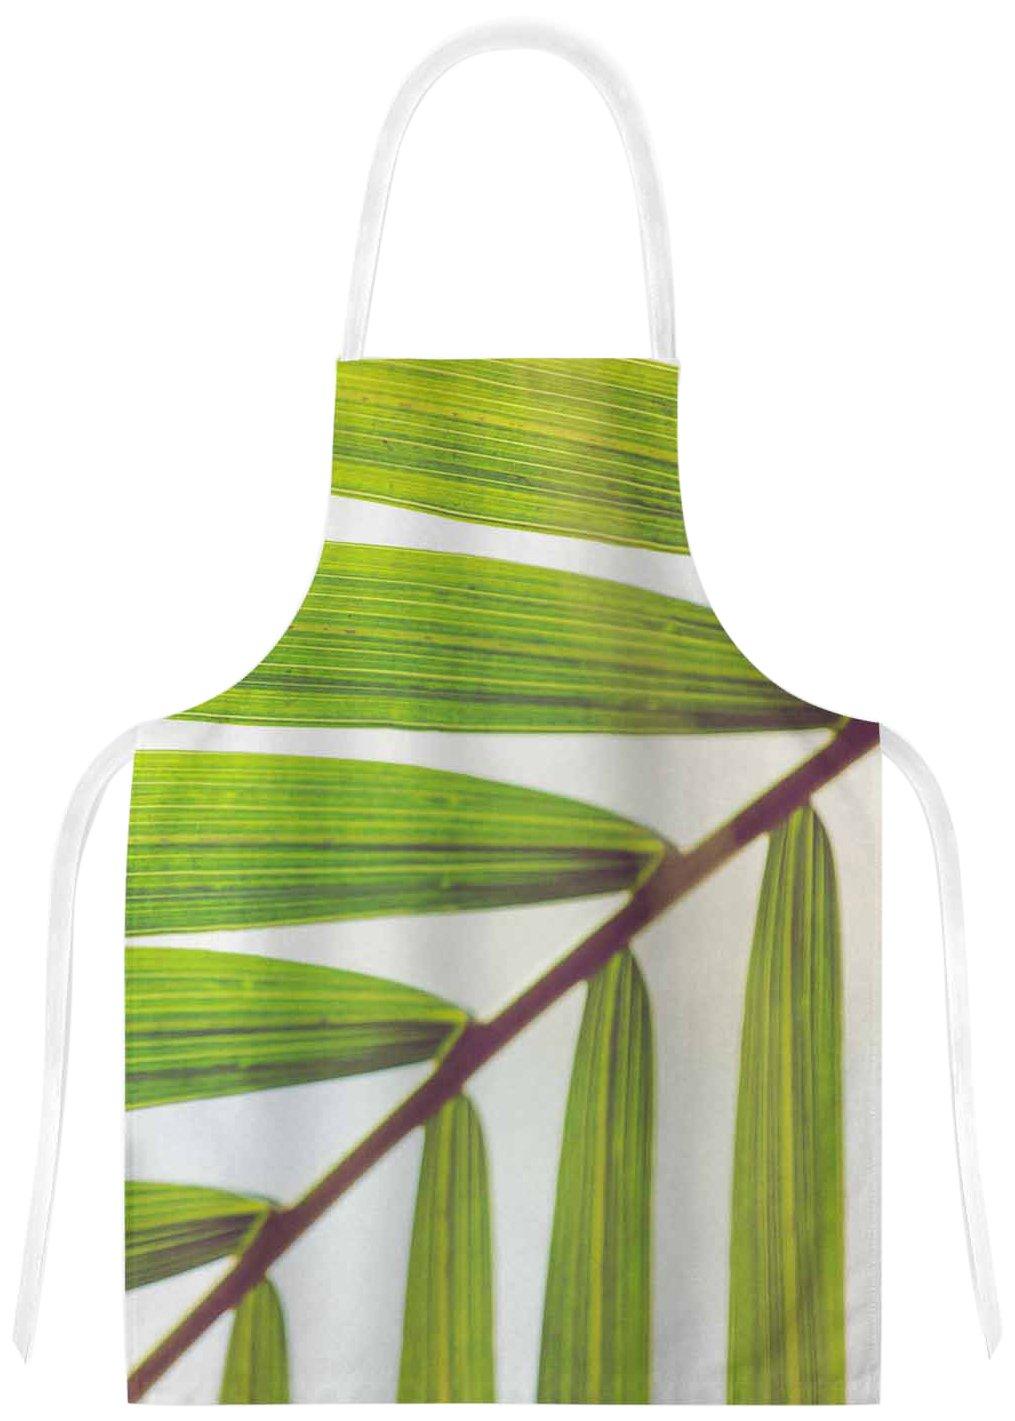 31 x 36 Multicolor KESS InHouse AB2054AAR01 Ann BarnesJungle Abstract Green White Artistic Apron